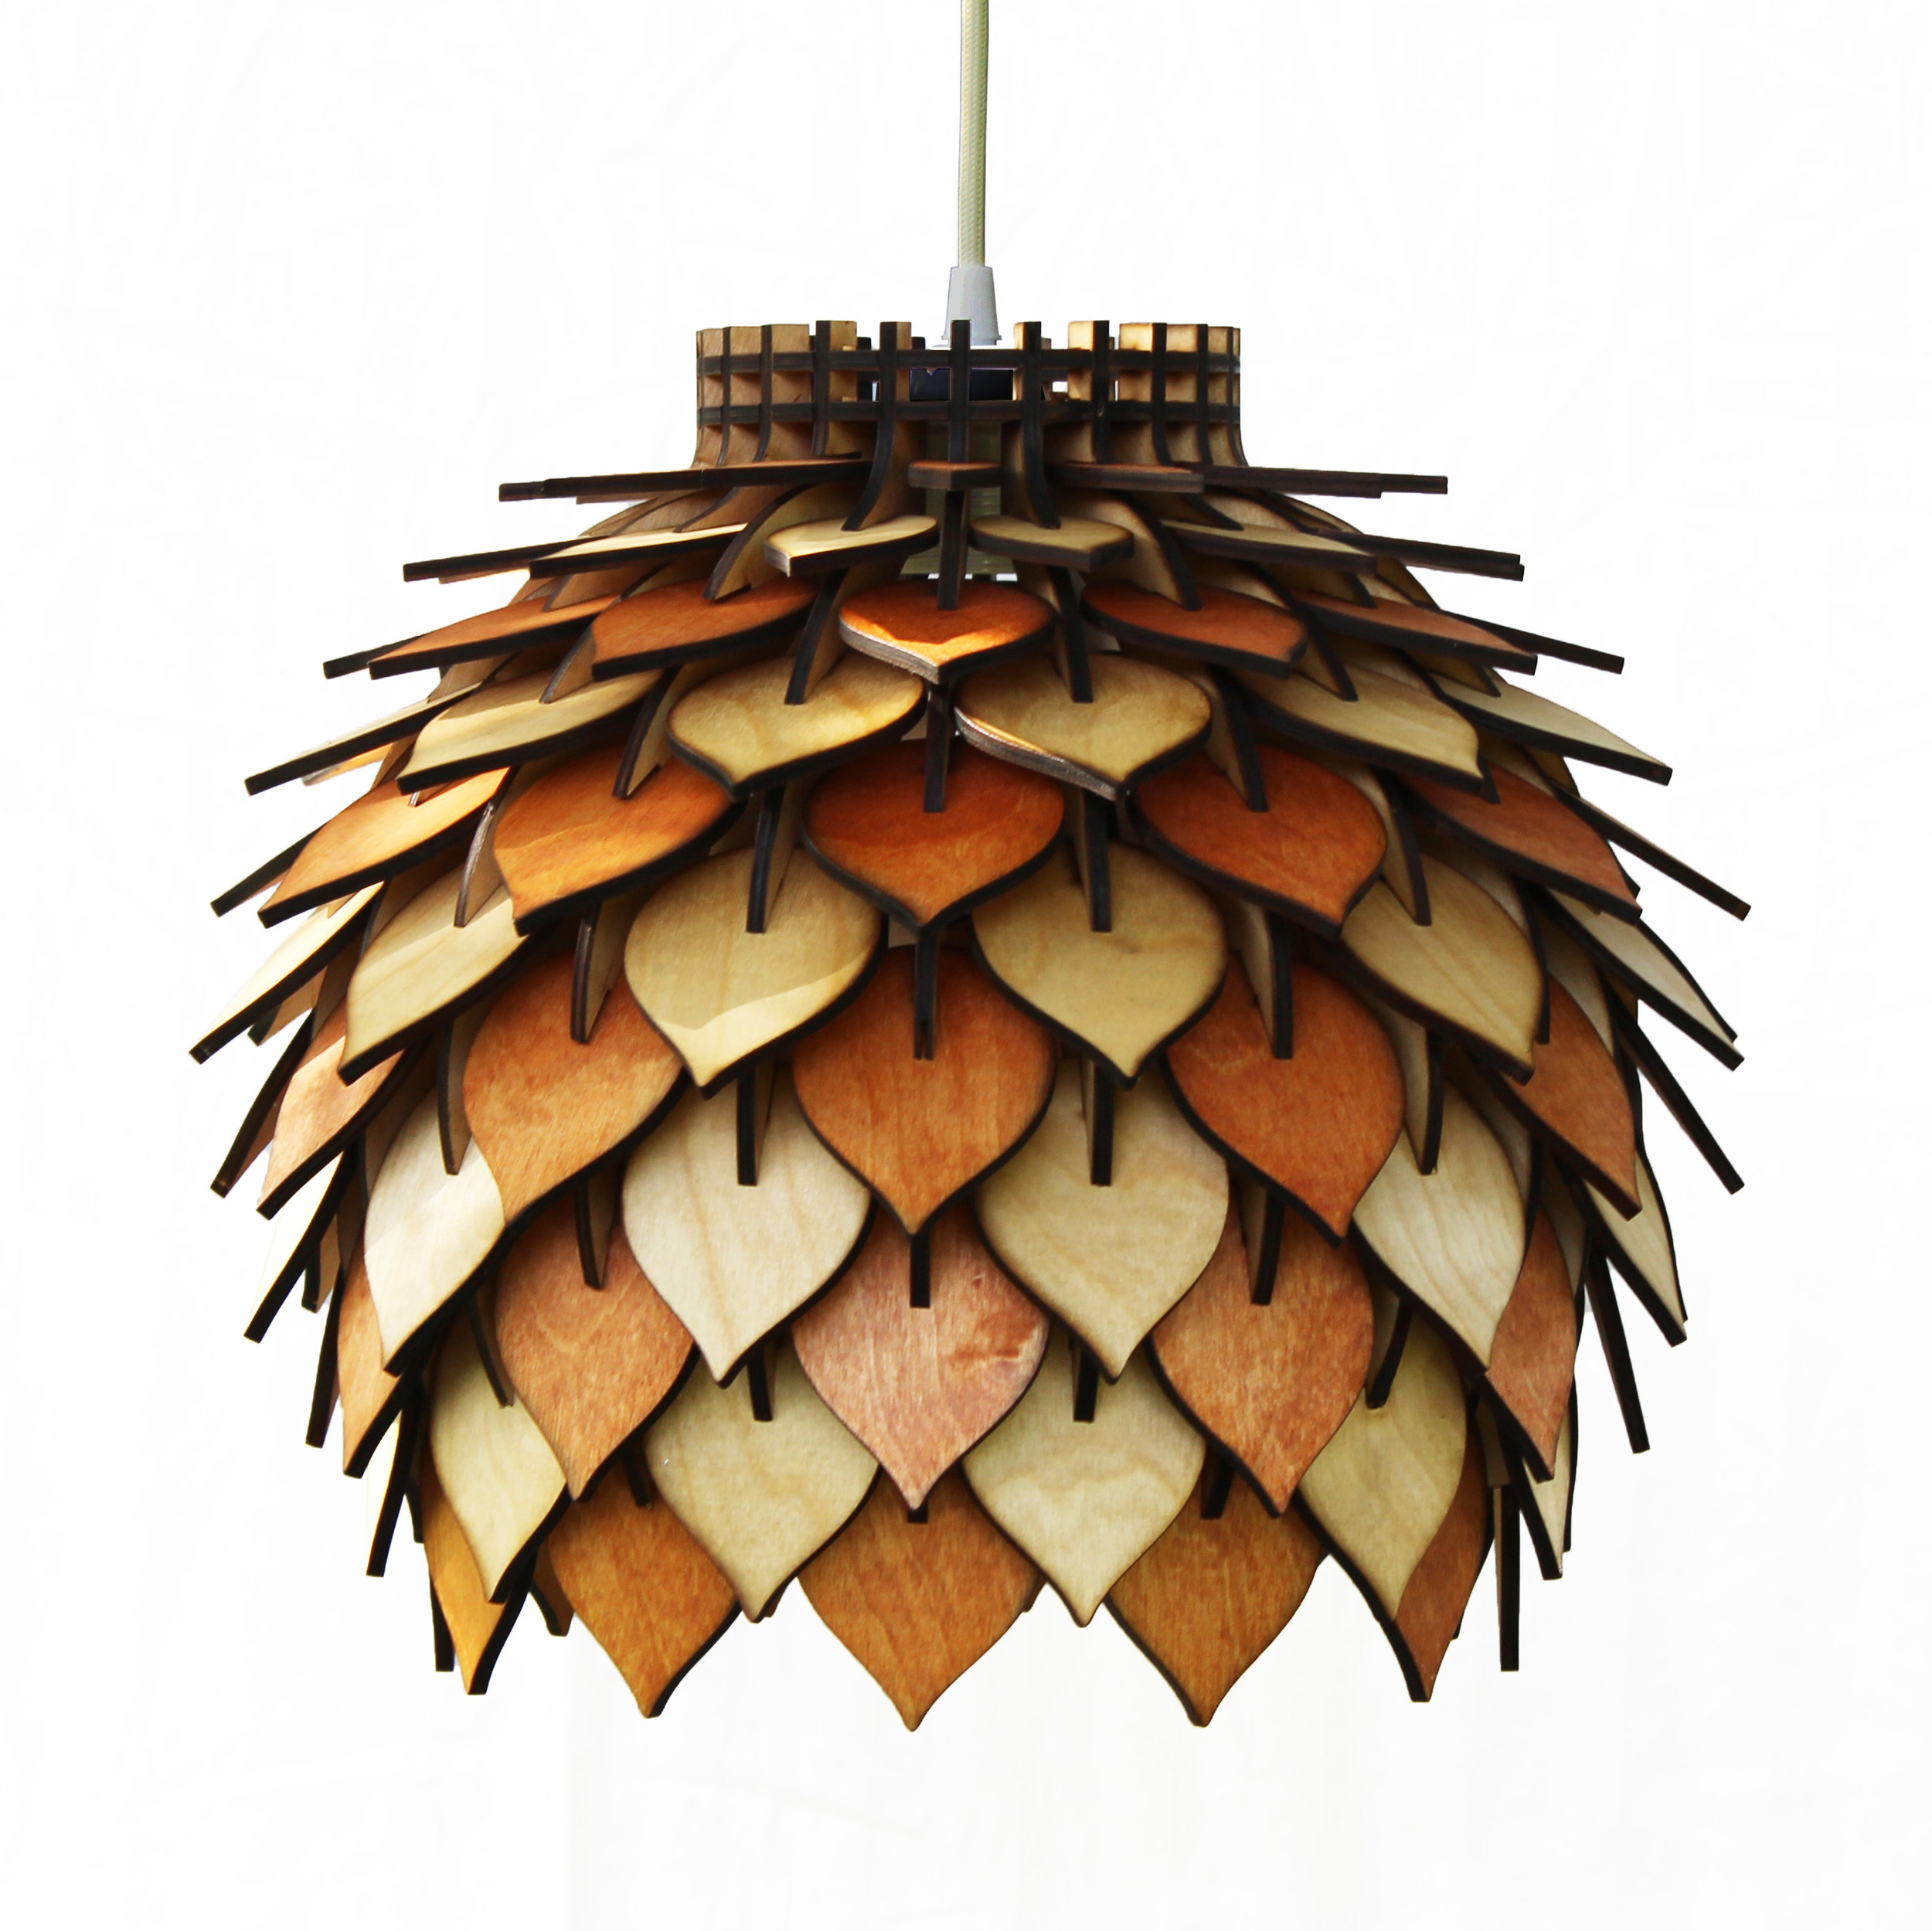 spore lamp 5 – handmade laser cut parametric postmodern interior light geometric wooden pendant lamp terraform design.jpg